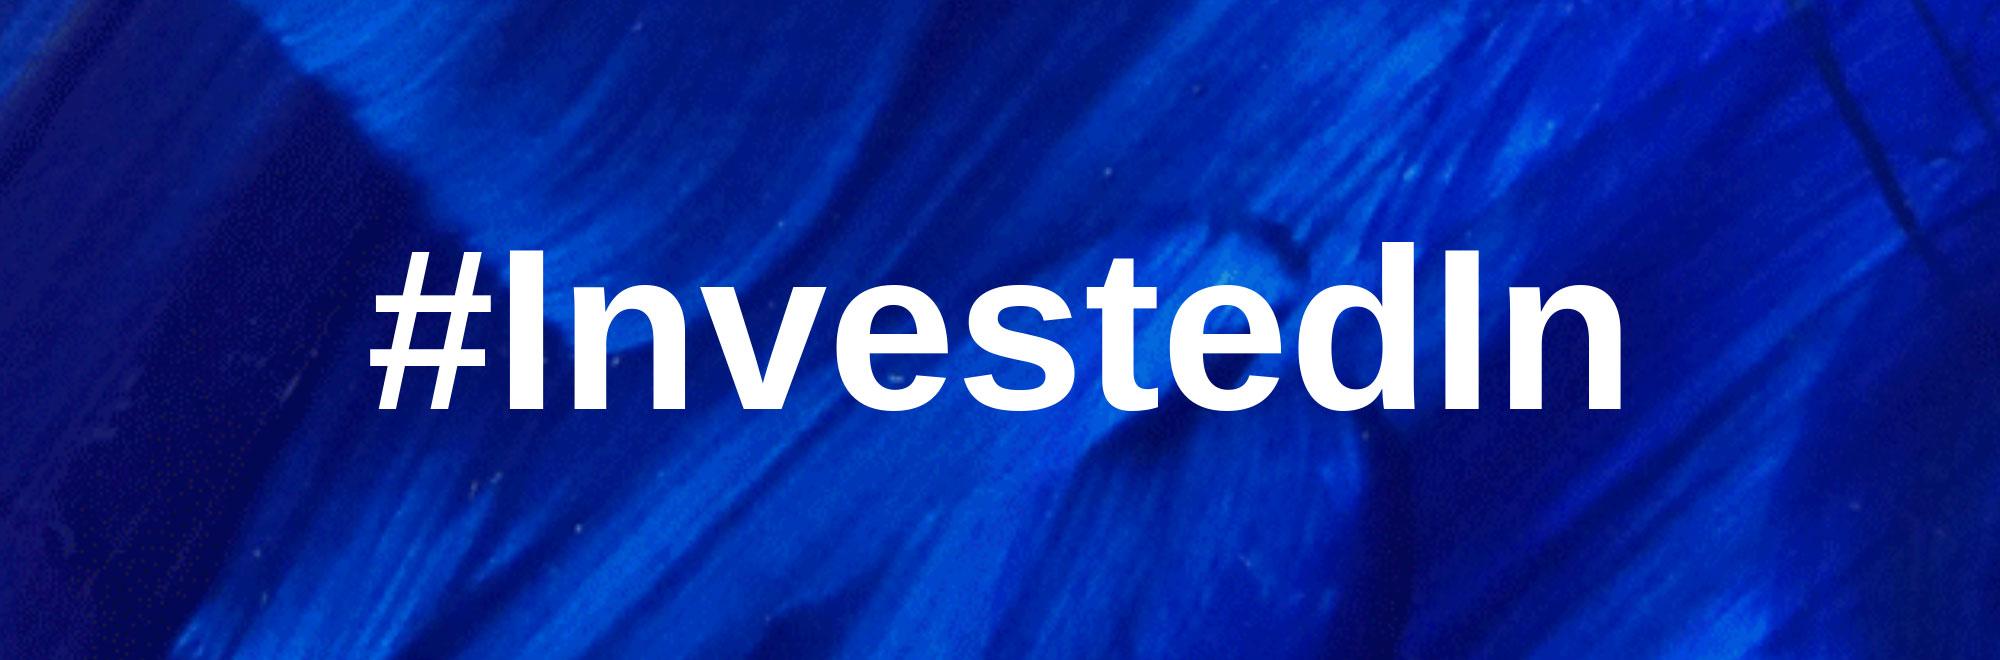 #InvestedIn